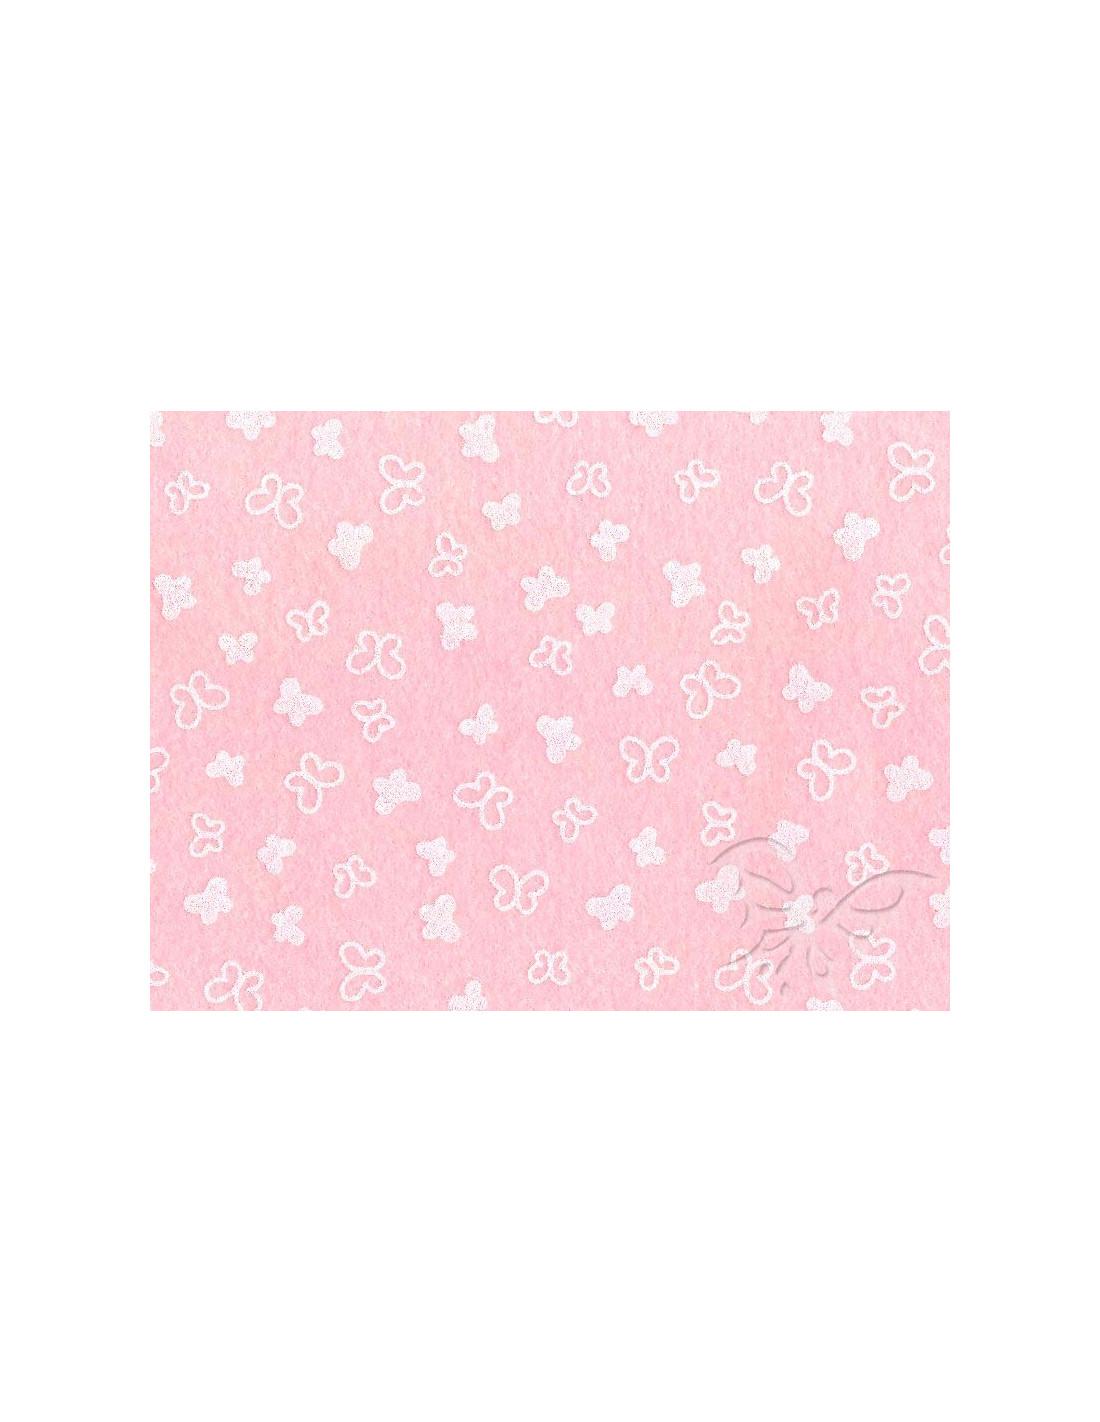 Feltro 1mm 30x40cm Farfalle Rosa Pastello Bianco 25017344